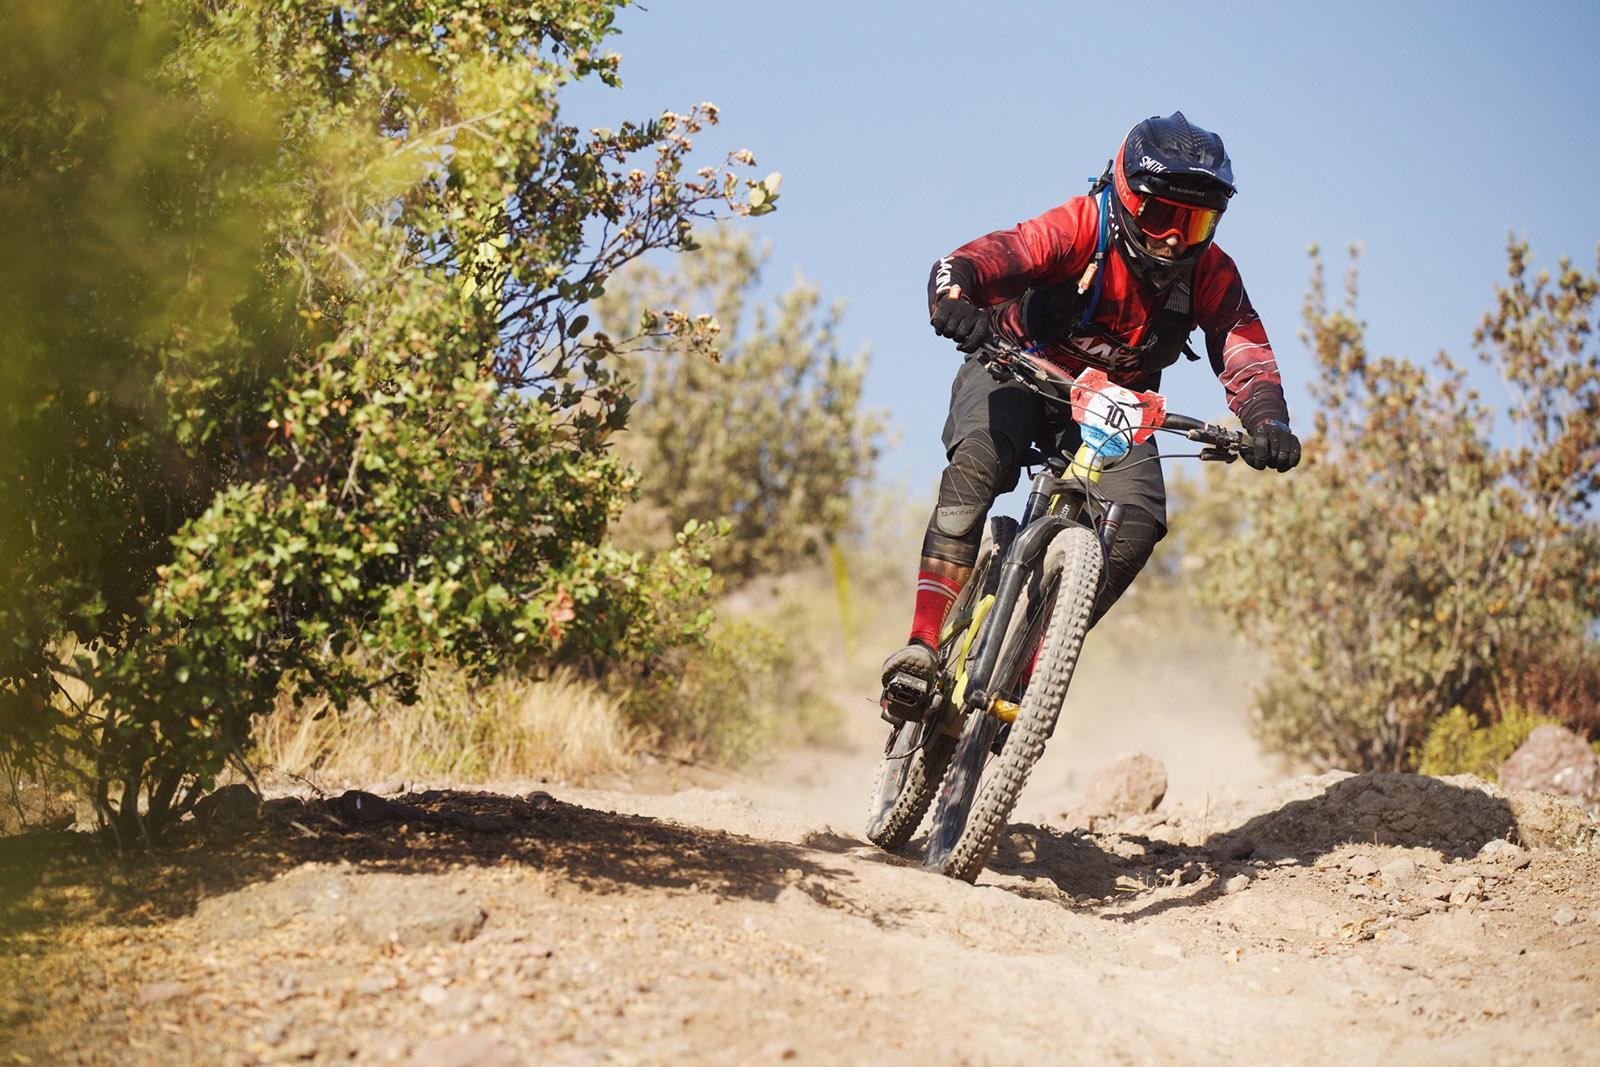 Santa Cruz Bicycles - Iago Garay of Santa Cruz X SRAM Enduro Team on Course